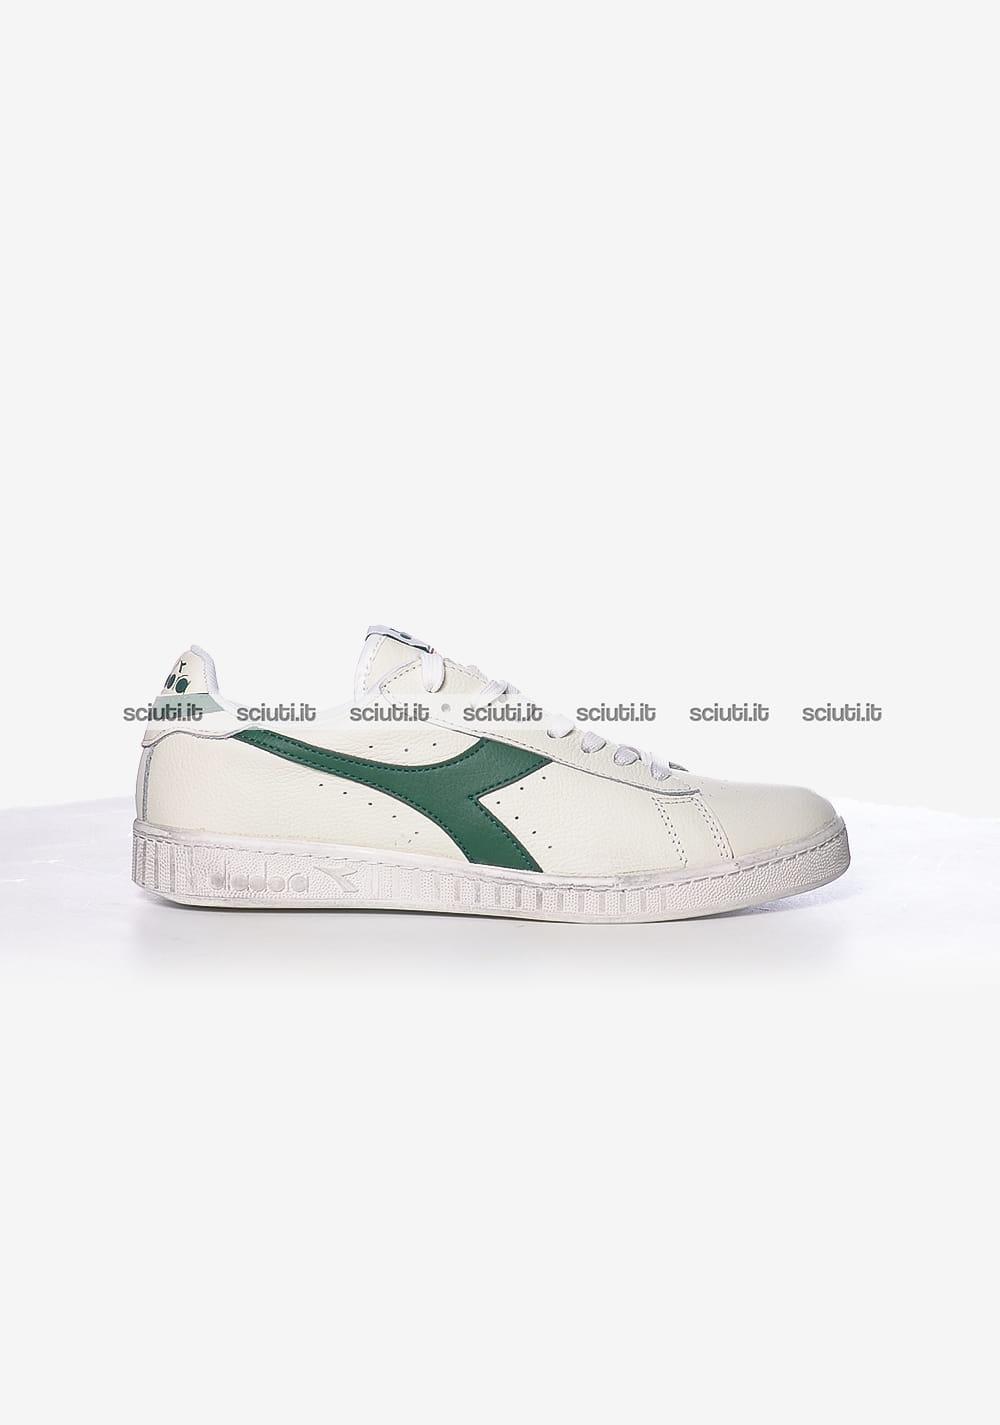 Scarpe Diadora uomo Game L Low waxed bianco verde